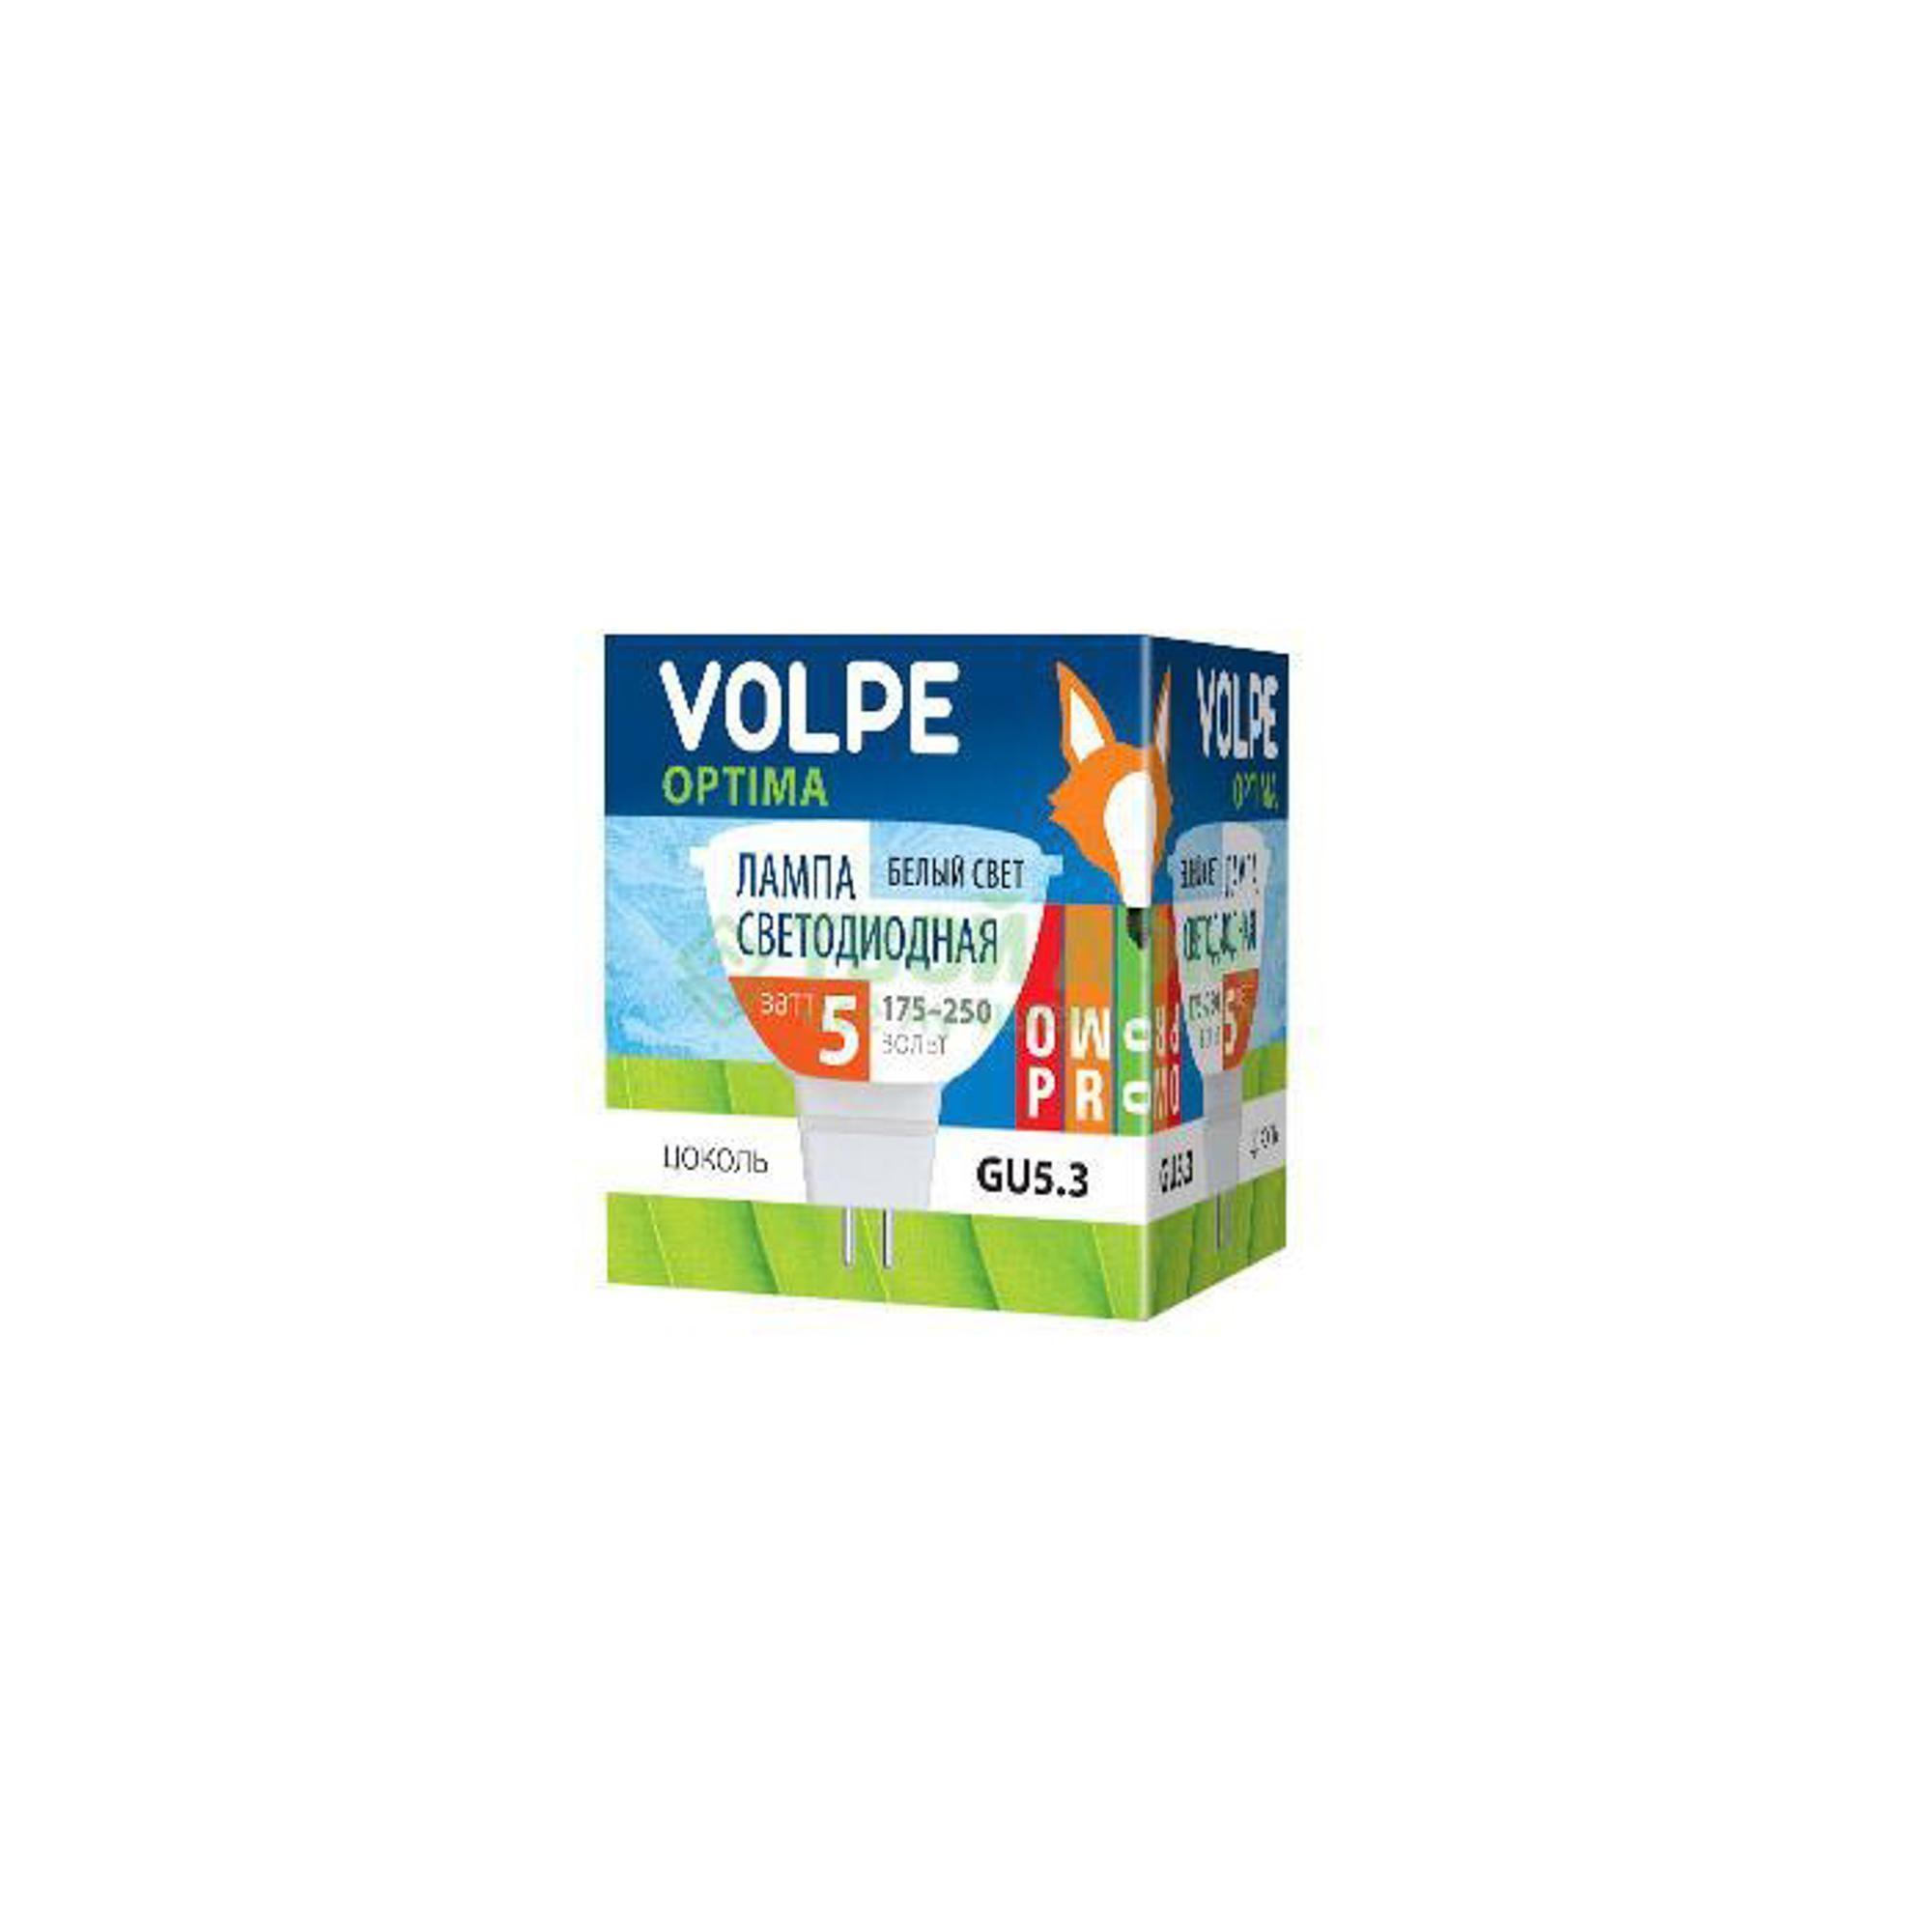 Купить Лампочка Volpe LED-JCDR-5W/NW/GU5.3/O КАРТОН, светодиодная лампа, Китай